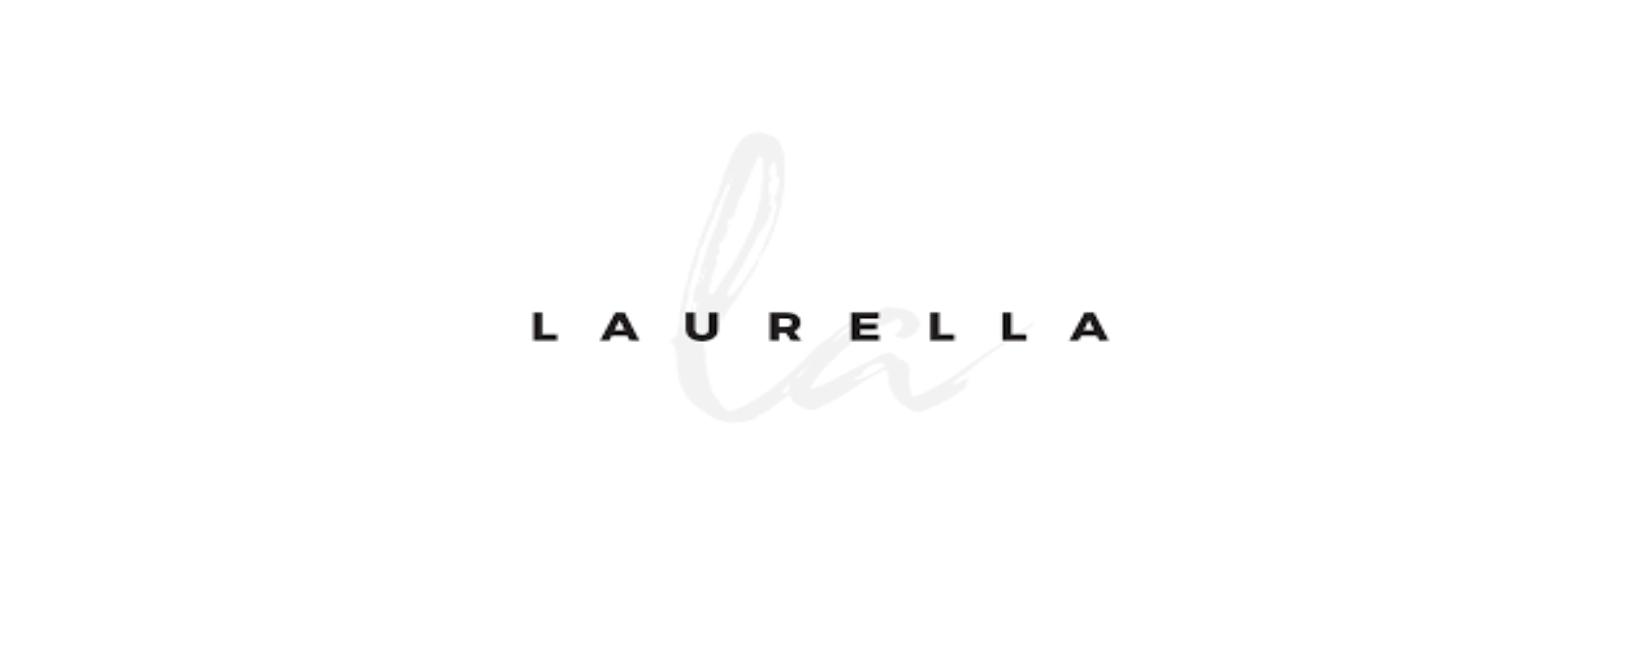 Laurella Discount Code 2021